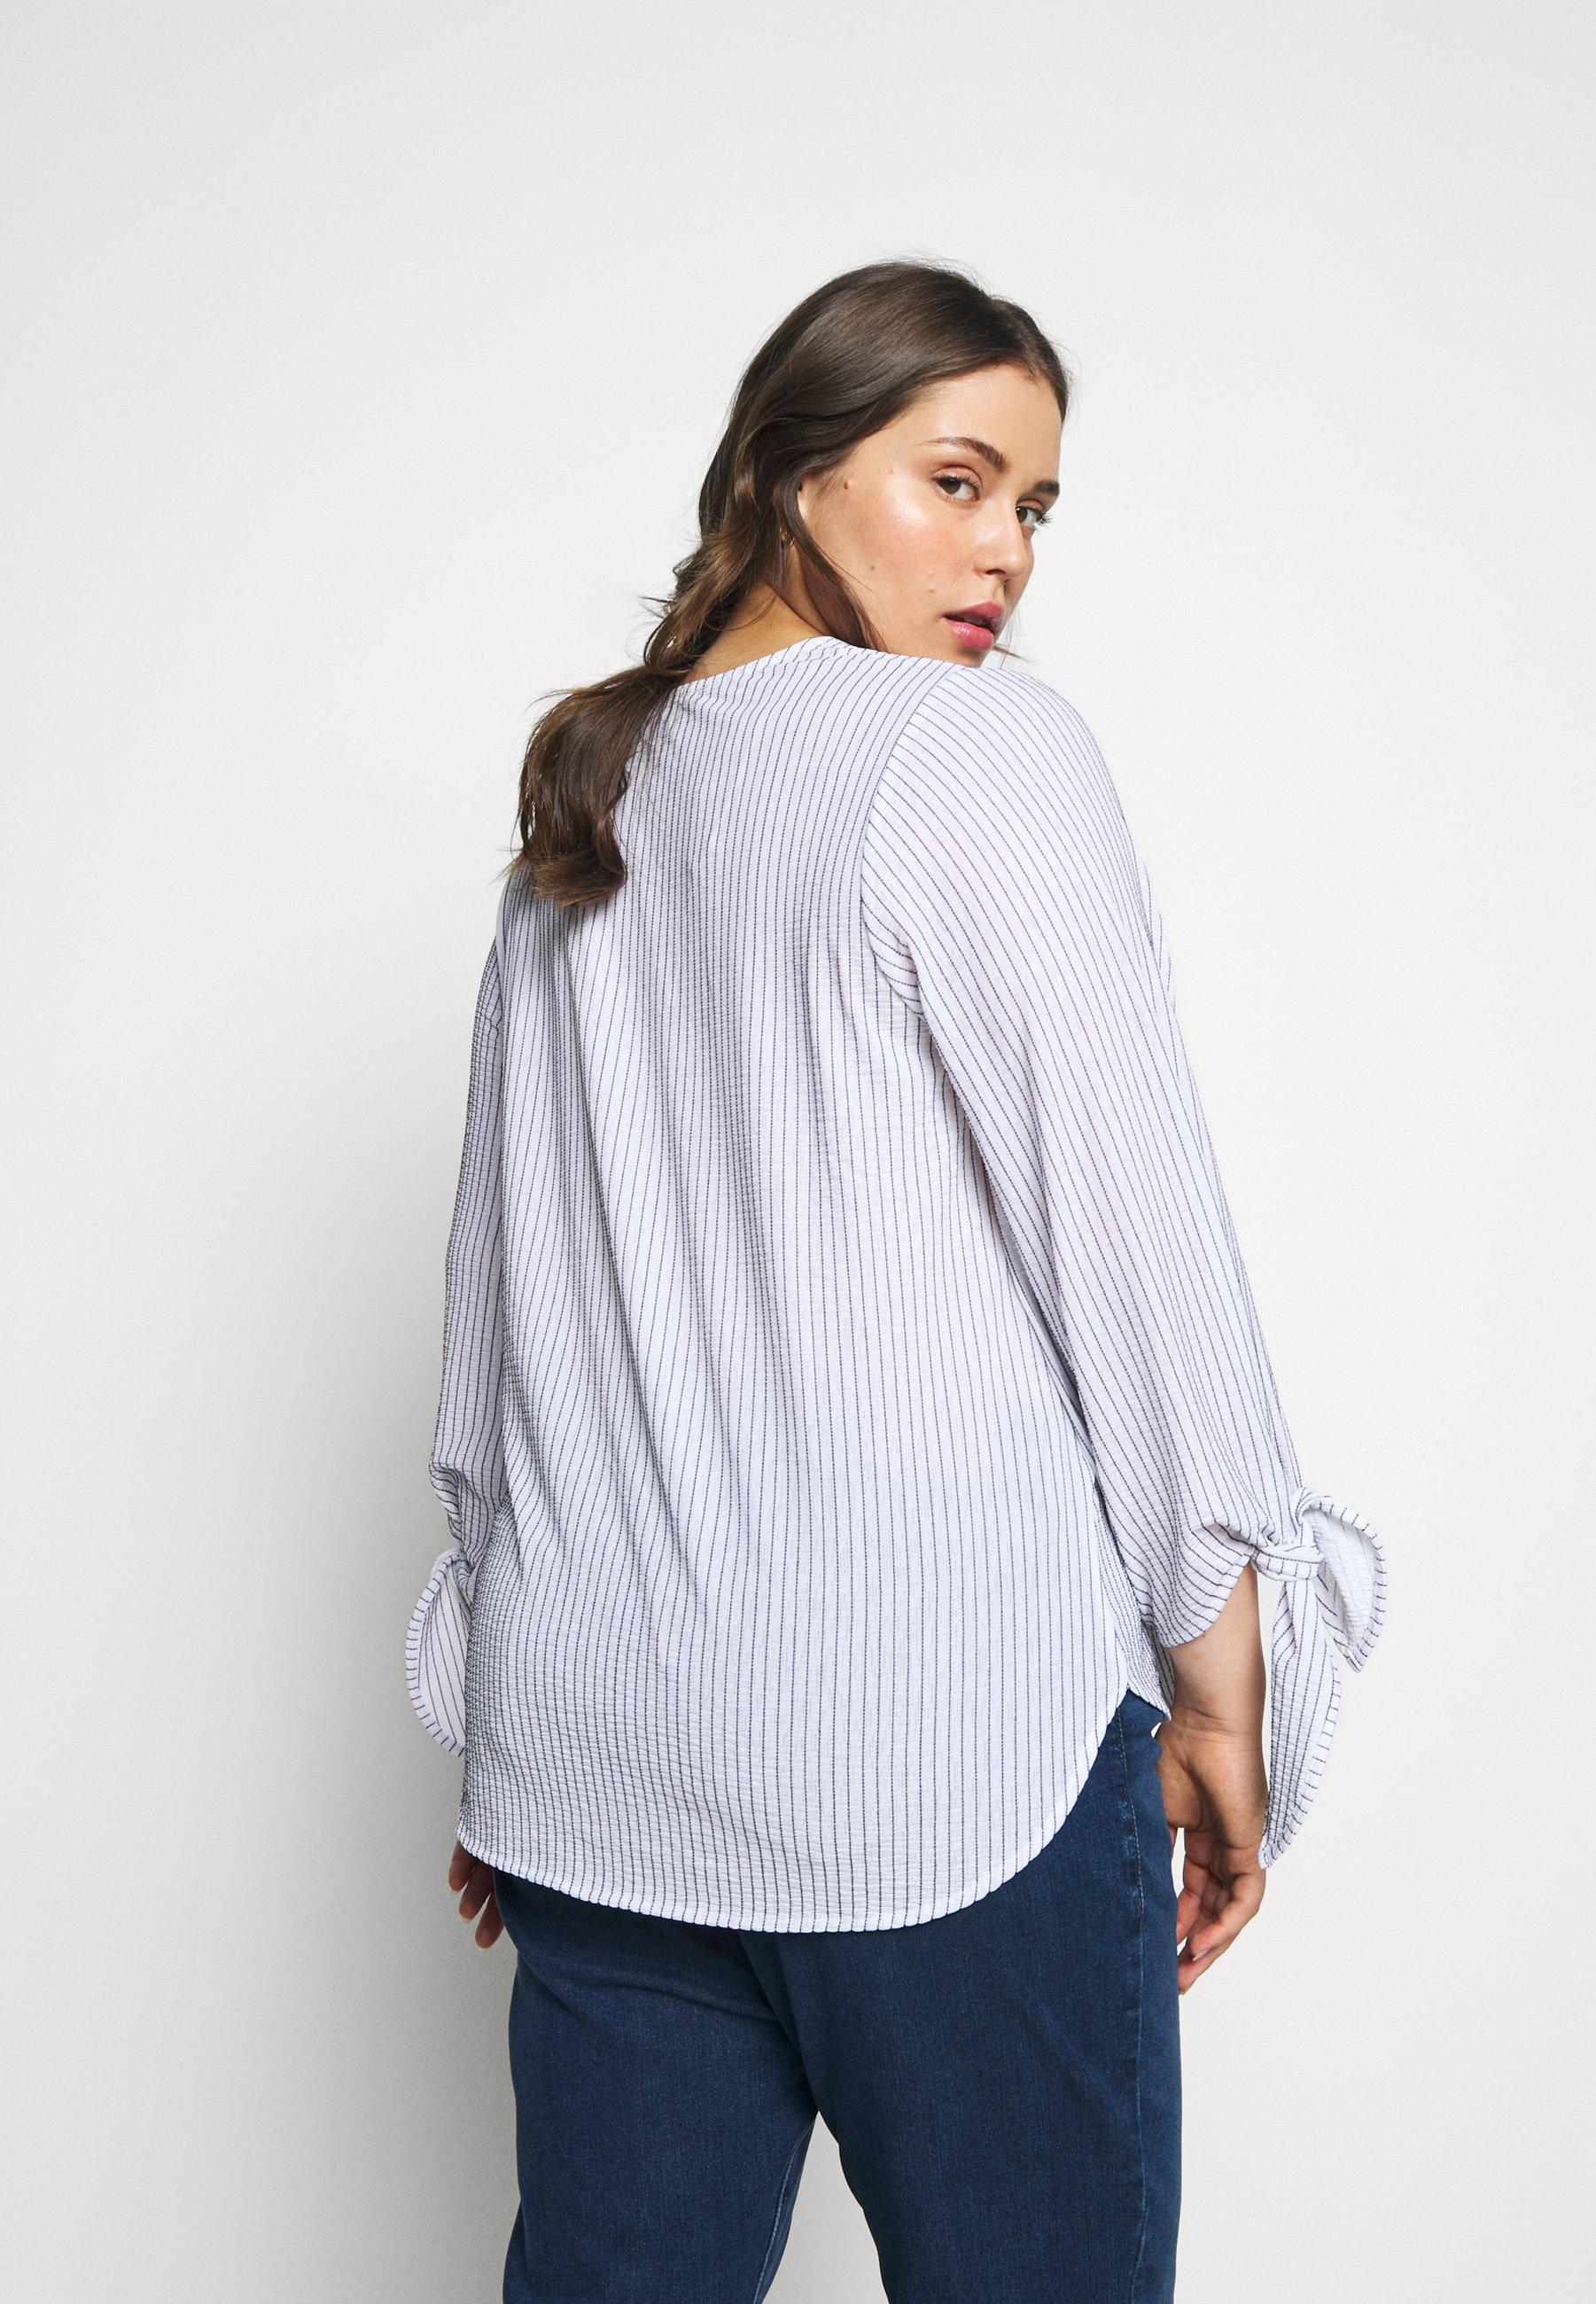 100% Guaranteed Women's Clothing MICHAEL Michael Kors Long sleeved top true navy tceWFakhU